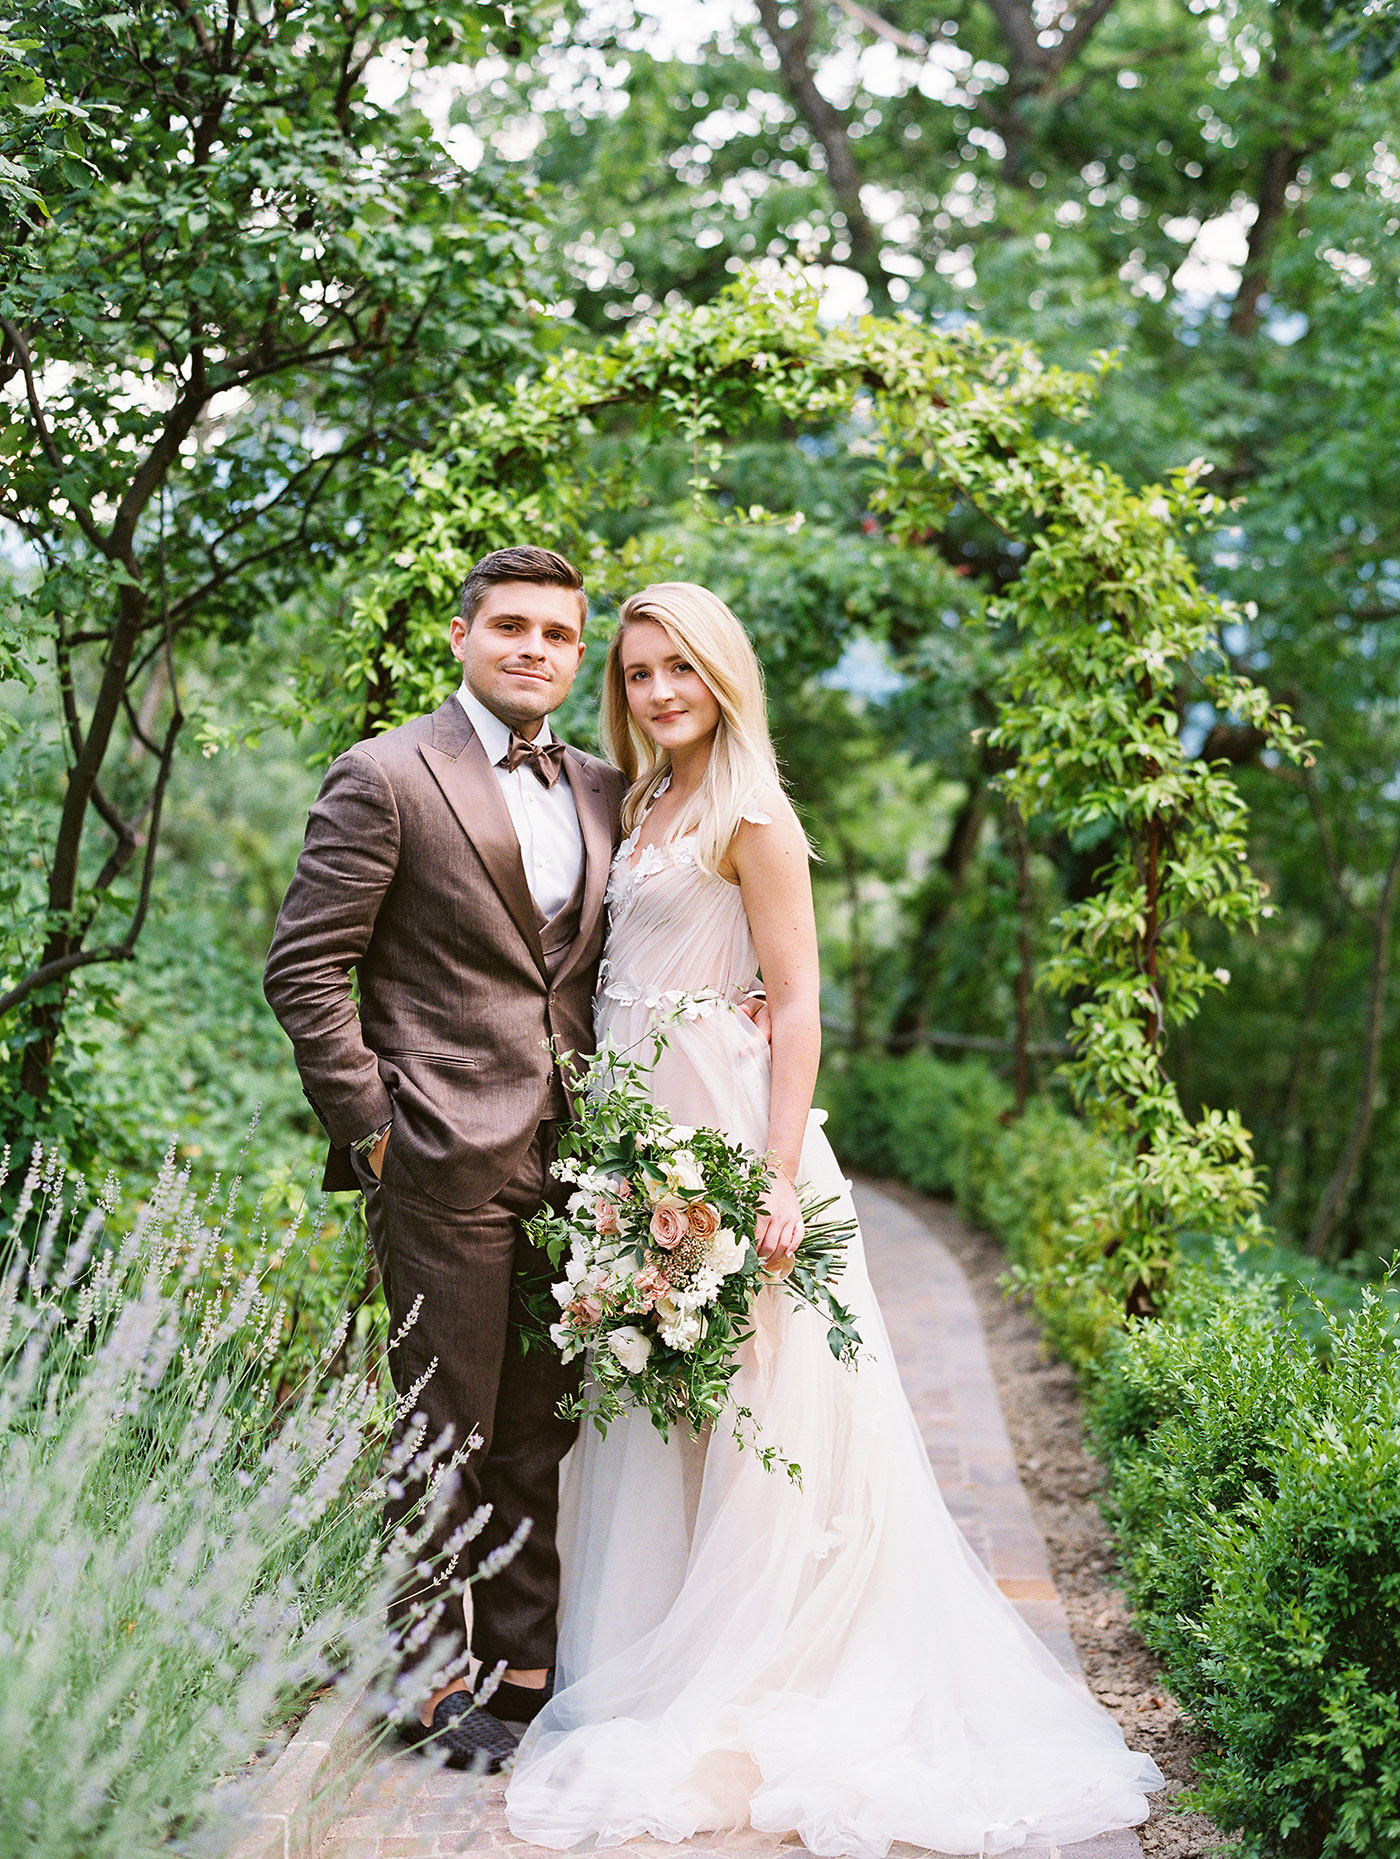 julia franz wedding couple pose